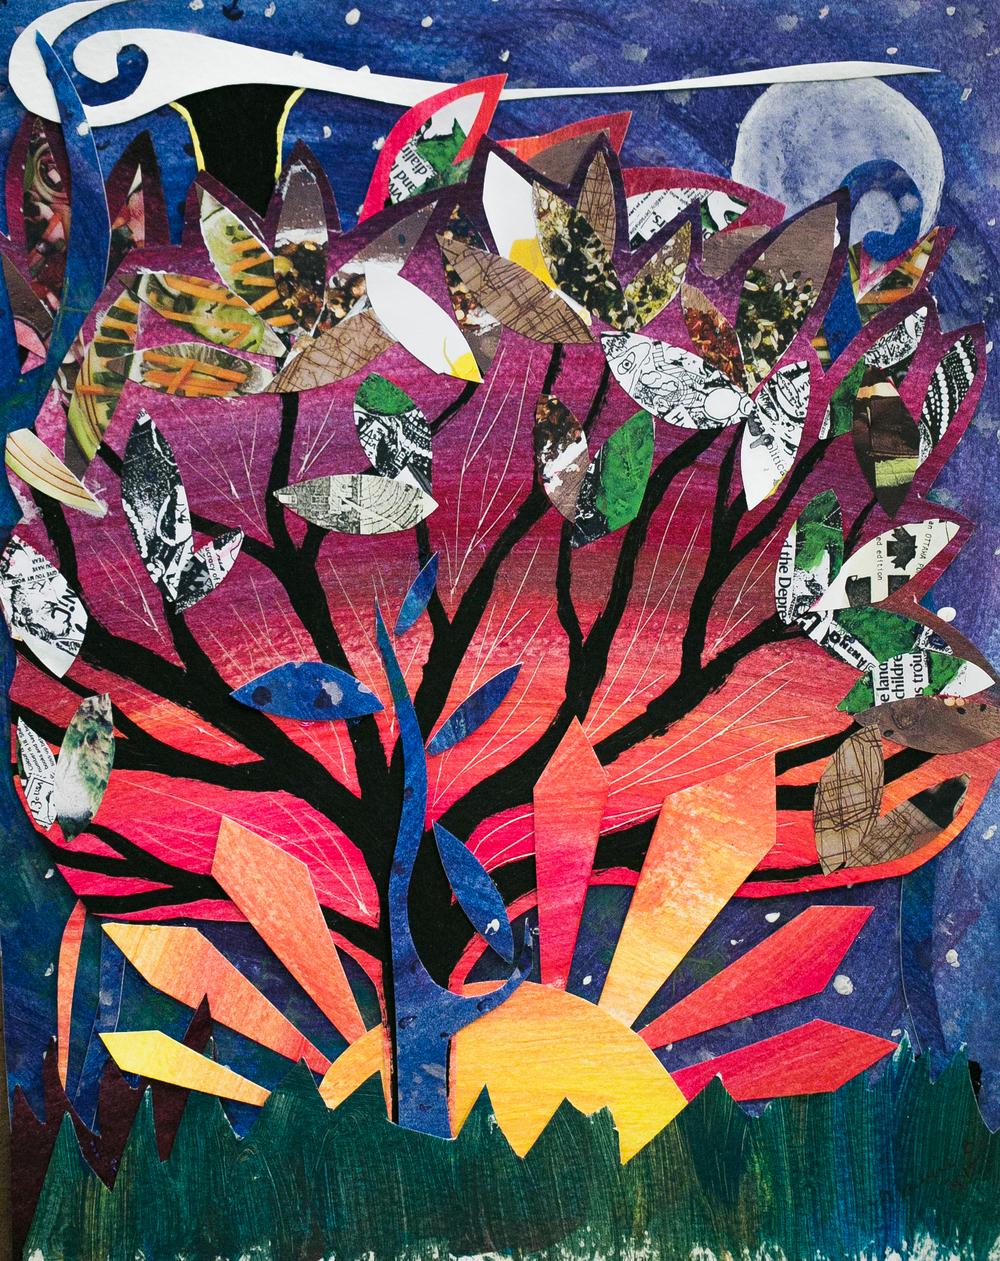 Mailyne Briggs Dream Love Grow Artist-5682.jpg